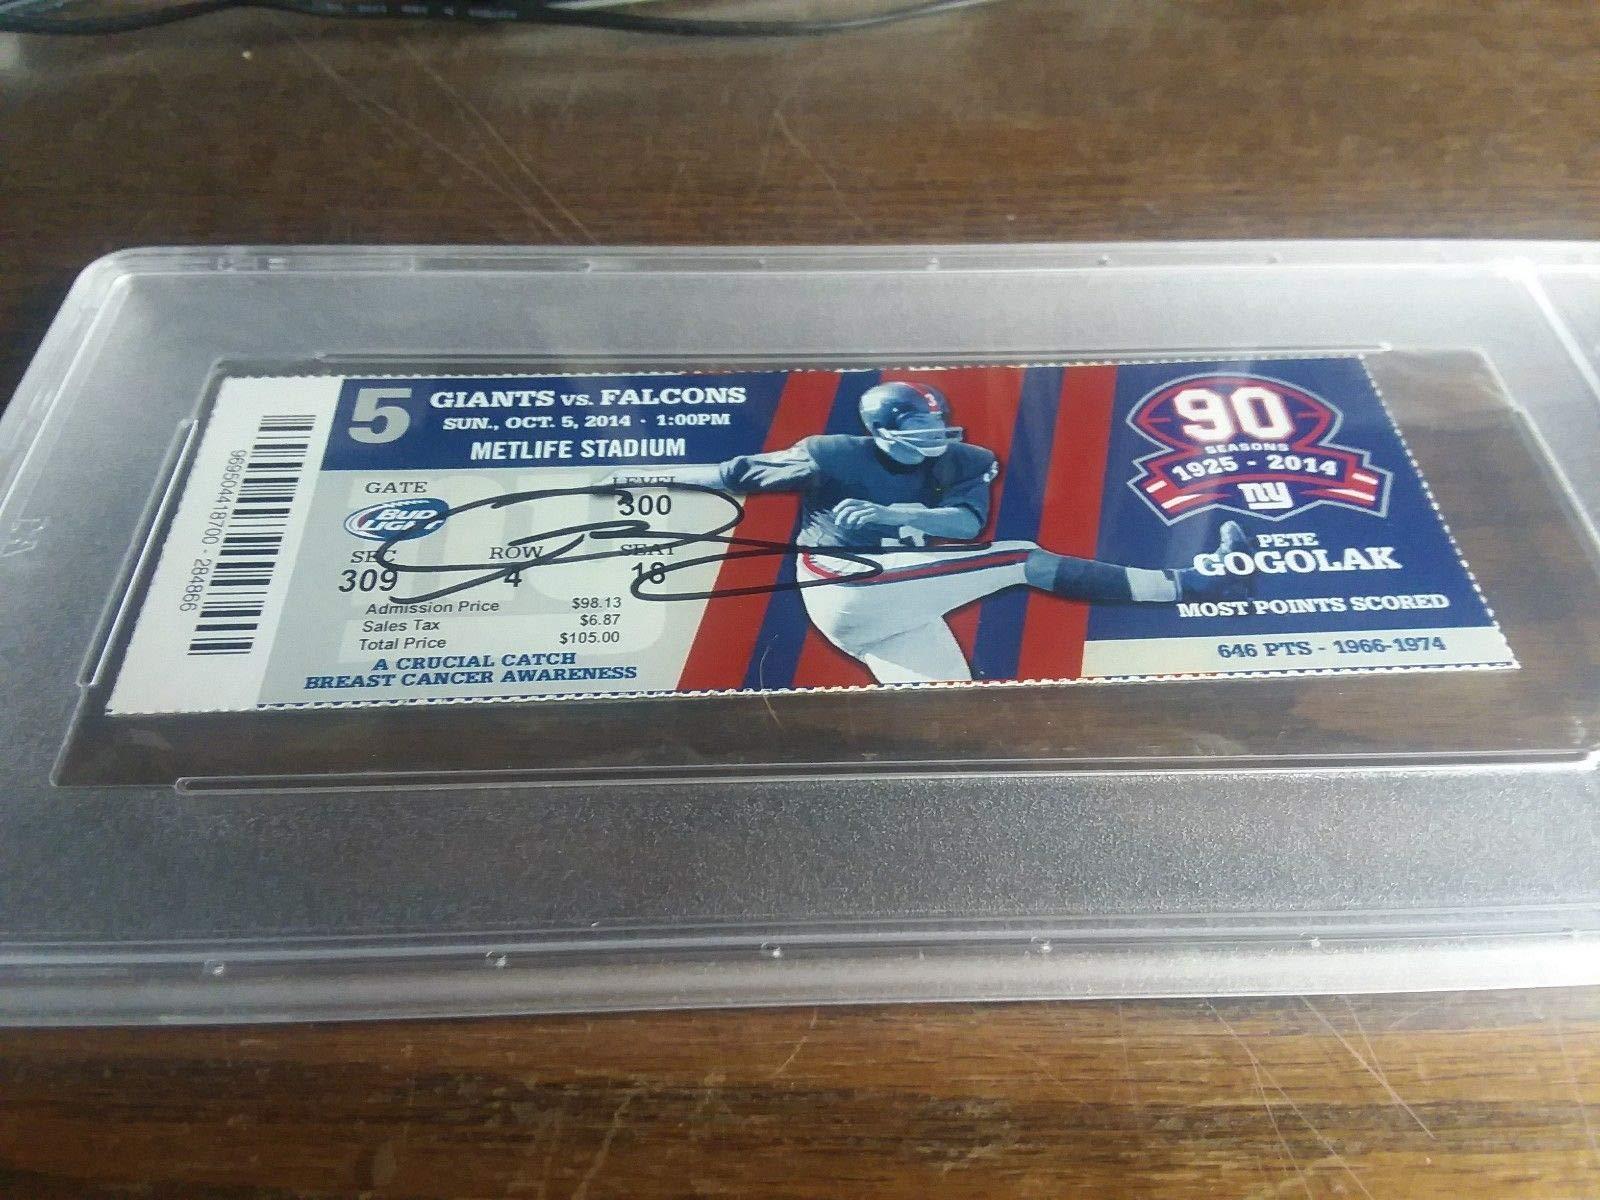 Odell Beckham Jr. Auto Autographed Signed NFL Debut Ticket New York Giants 10/5/2014 PSA/DNA